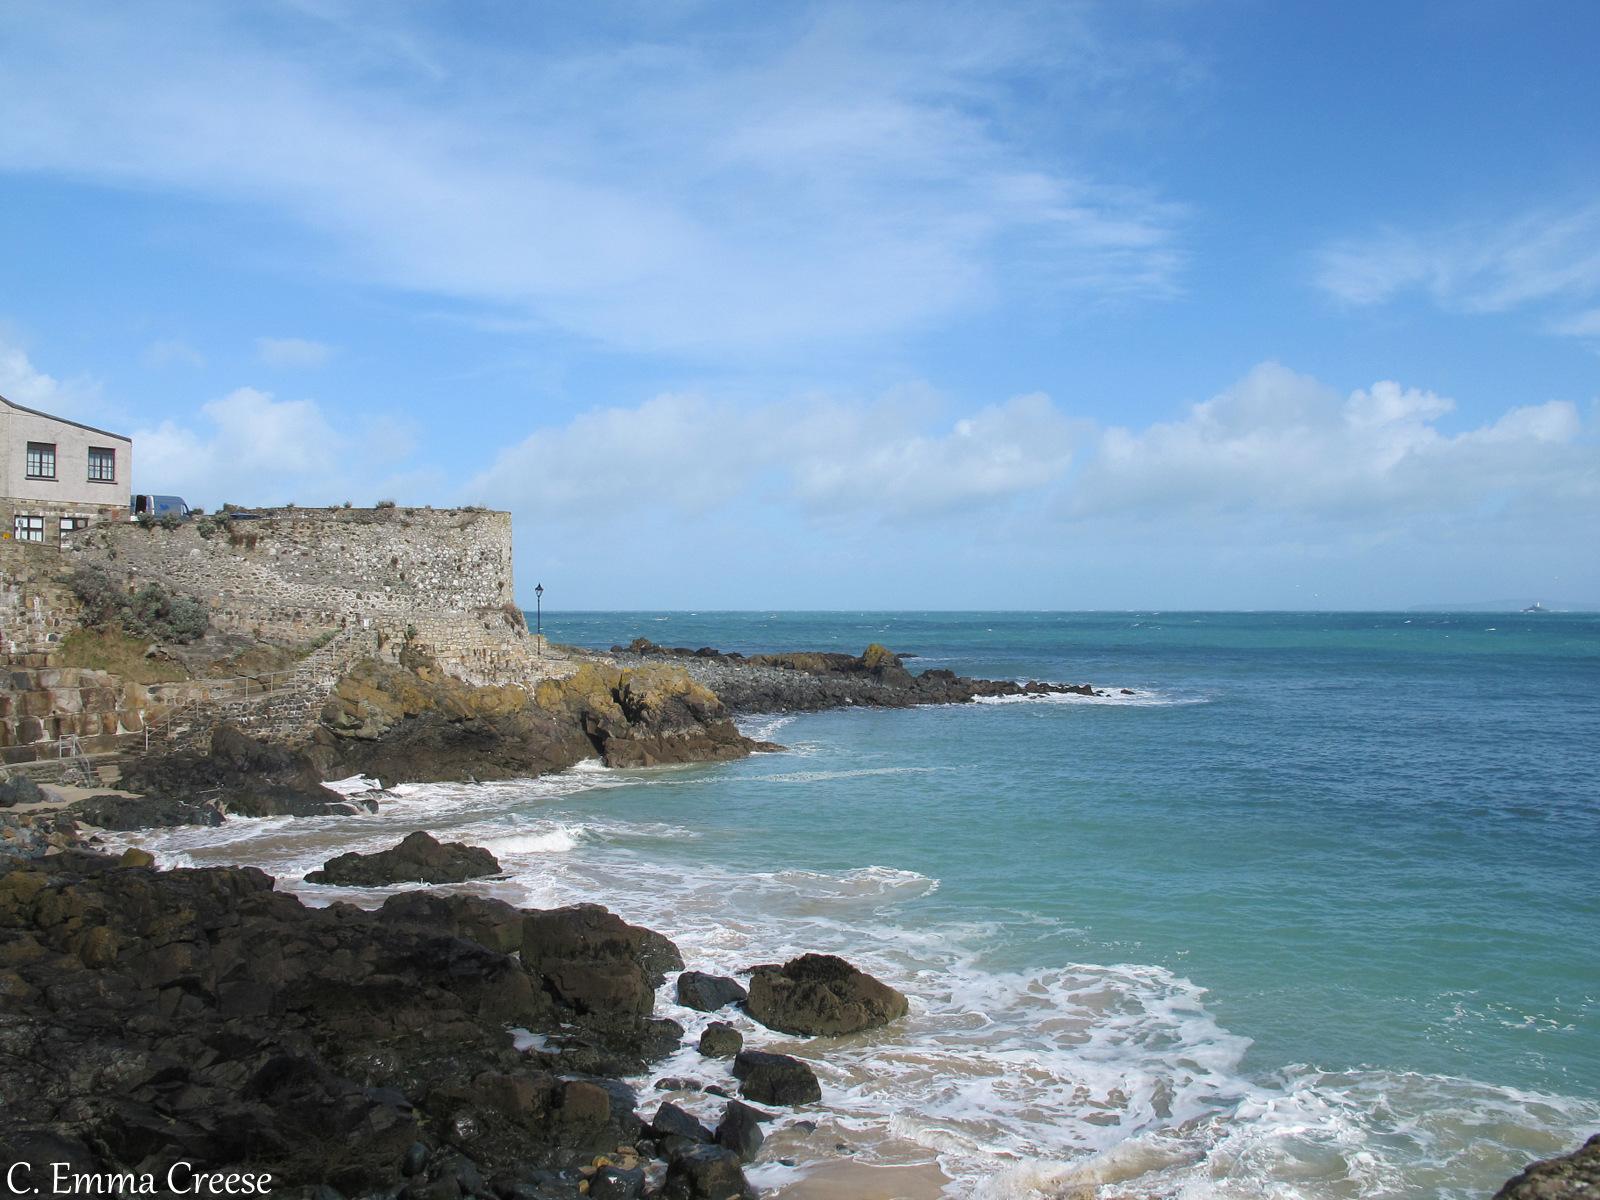 The Cornwall Coastline - Travel Wishlists and 2018 Plans - January #Travellinkup